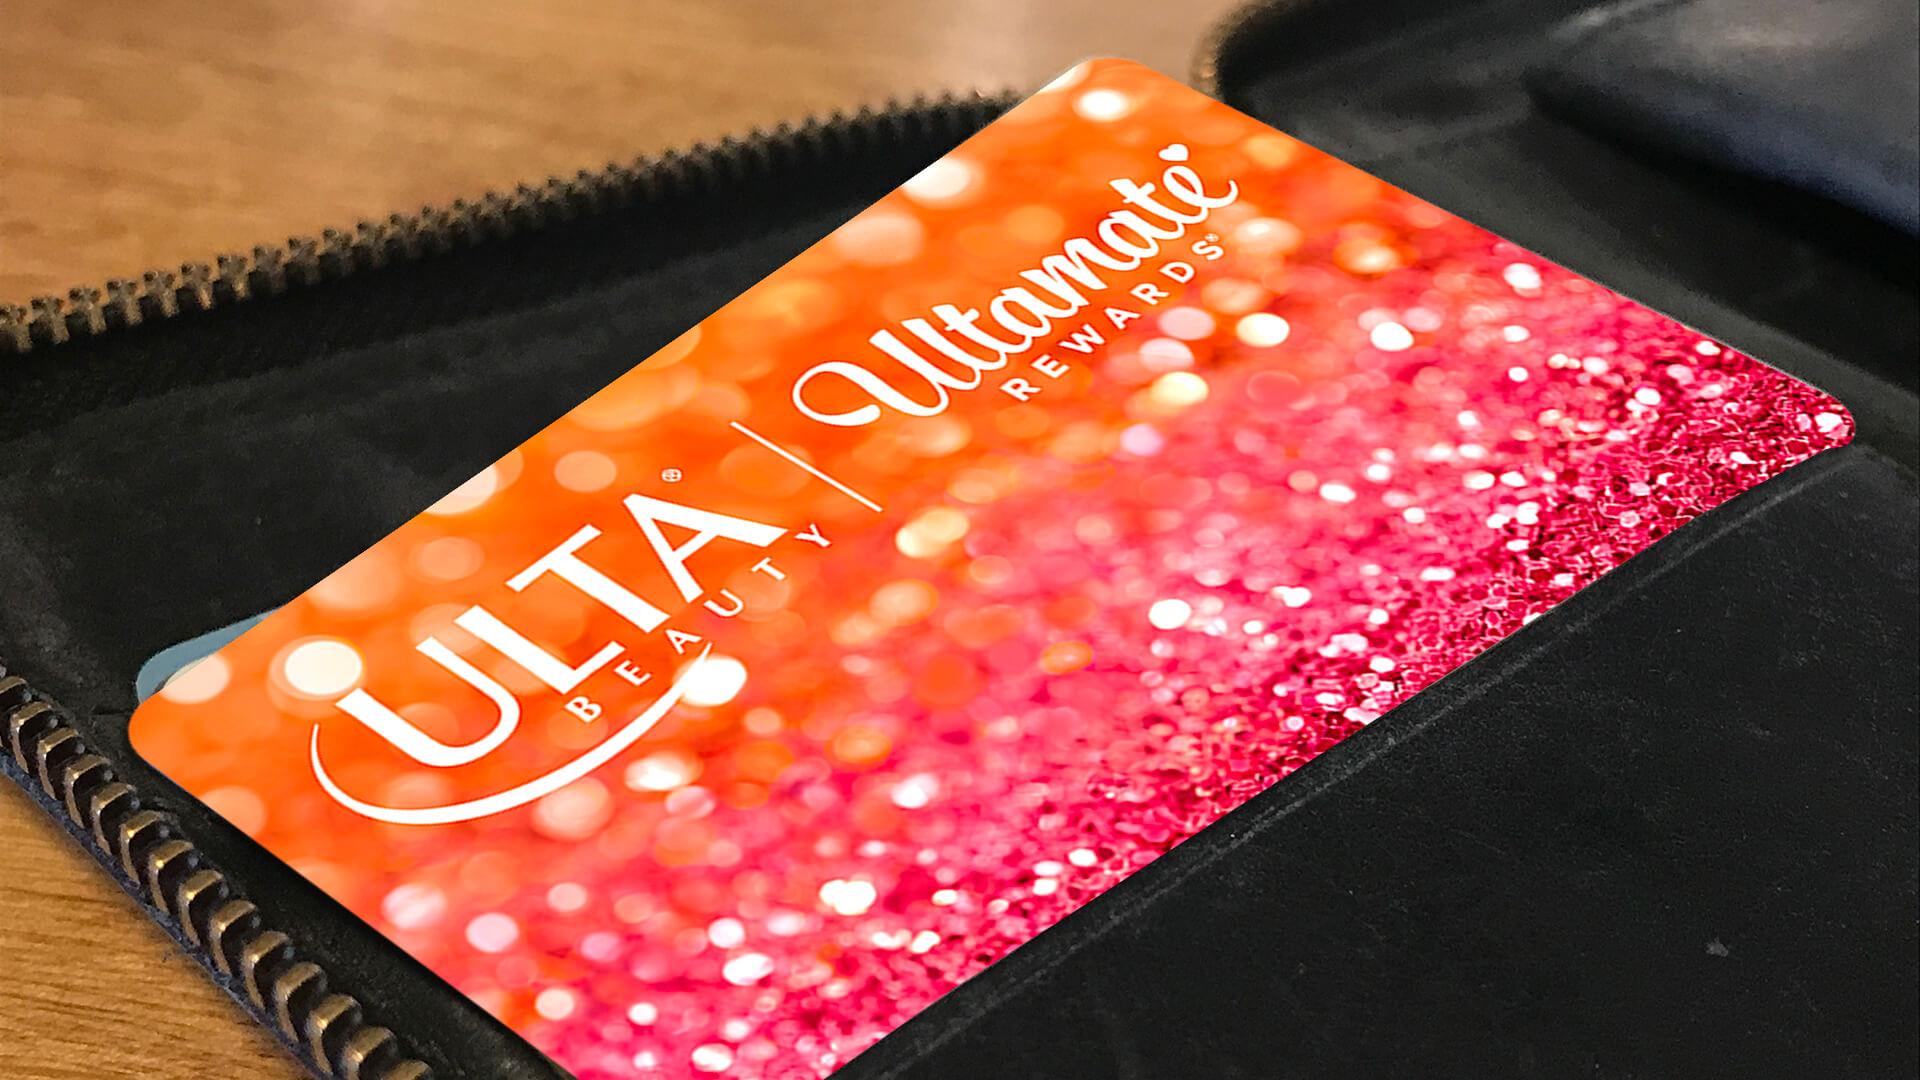 No Credit Check Credit Cards >> 10 Benefits of Having an Ulta Credit Card